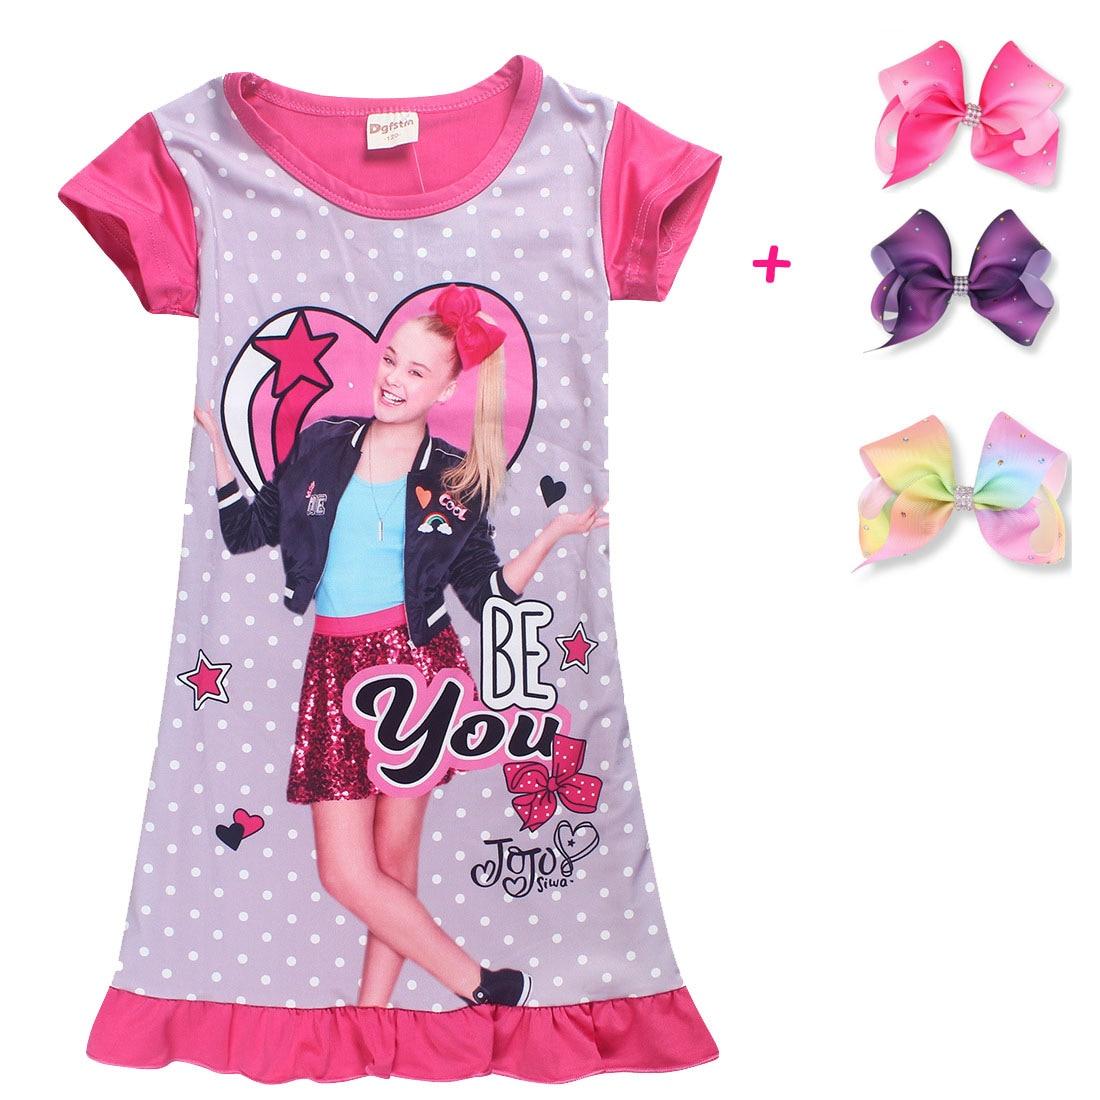 91e00b93ed5fc 2019 New Children Summer t shirt girls boys Clothes jojo siwa ...